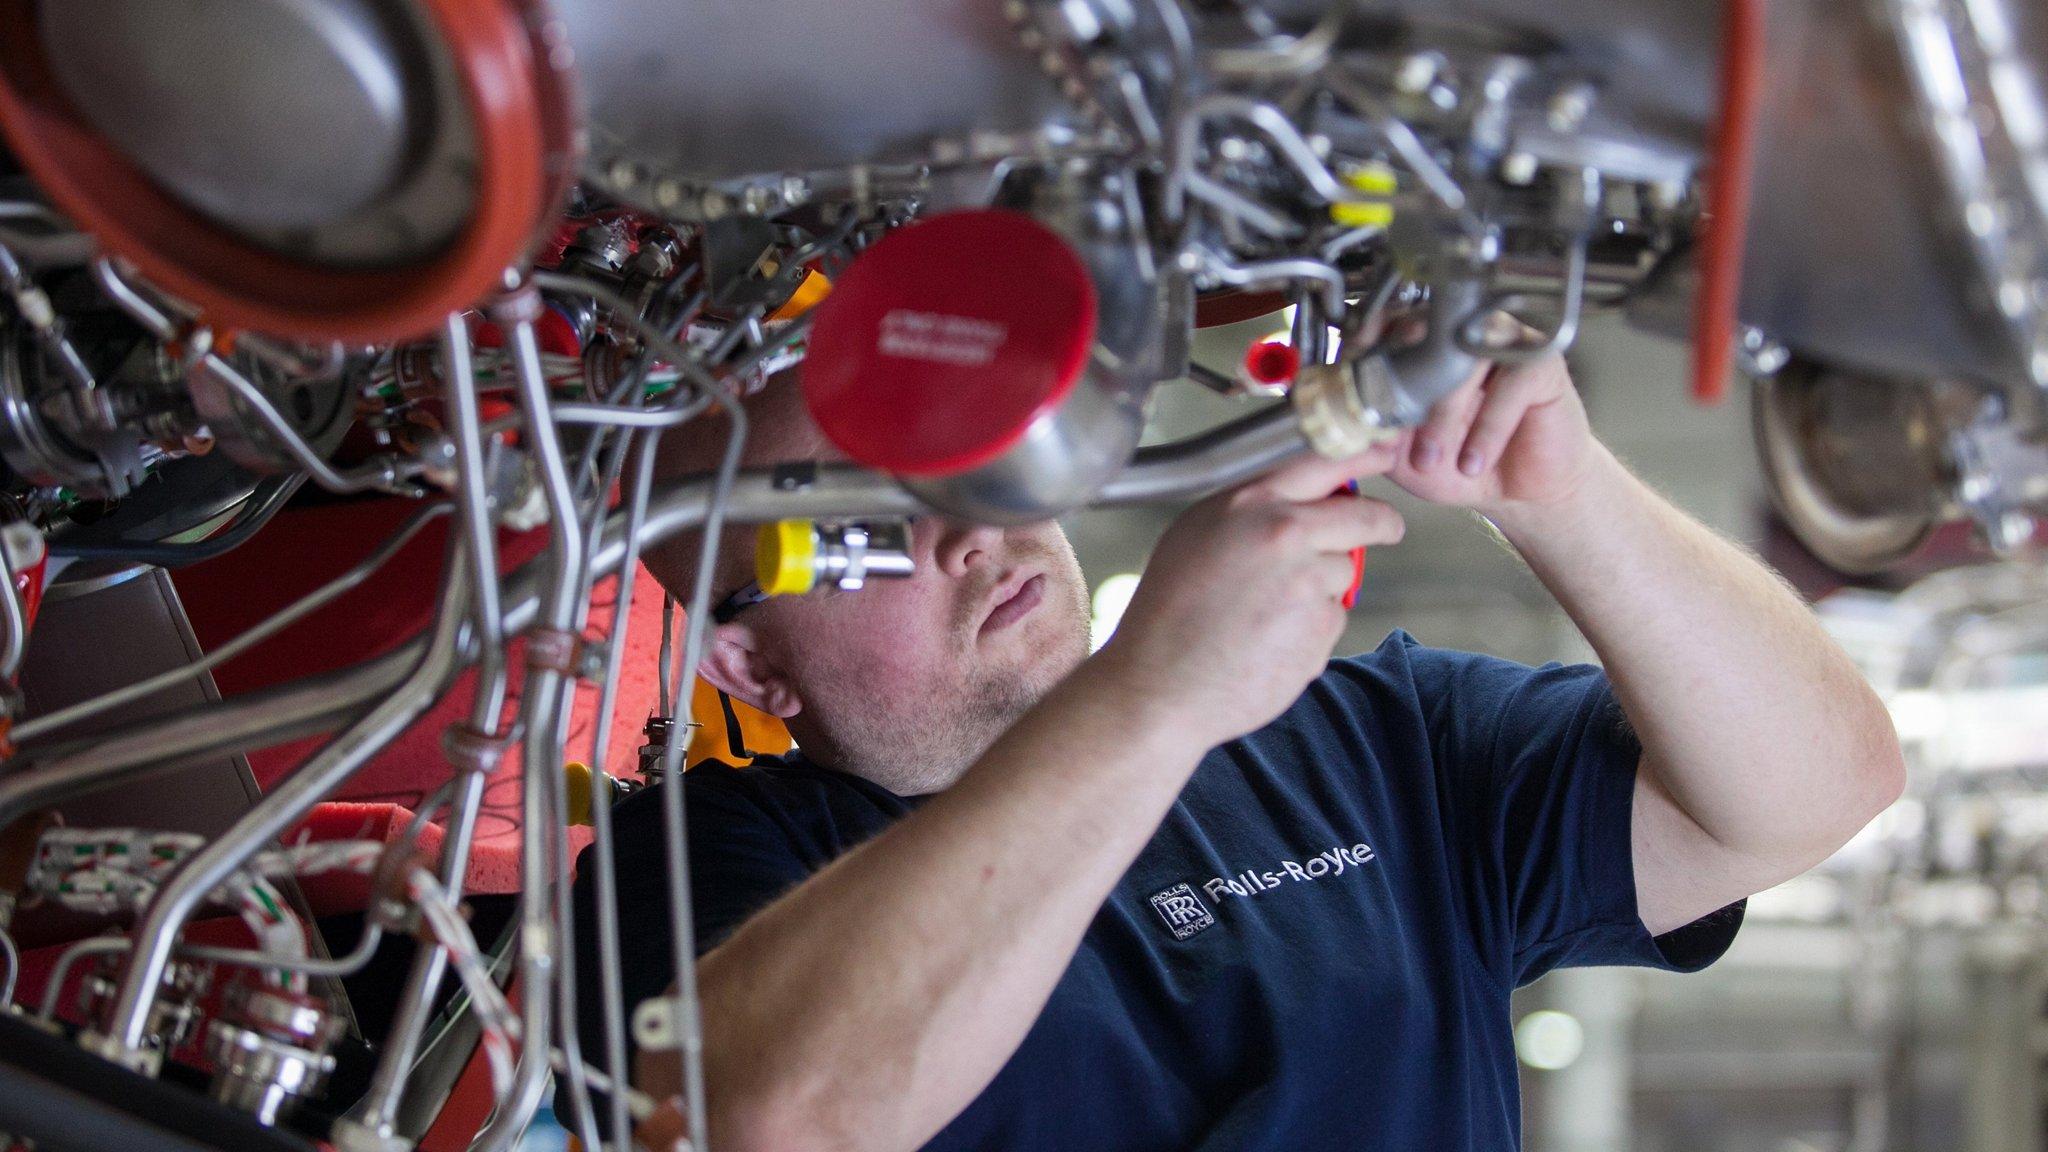 Rolls-Royce set to cut thousands of jobs | Financial Times